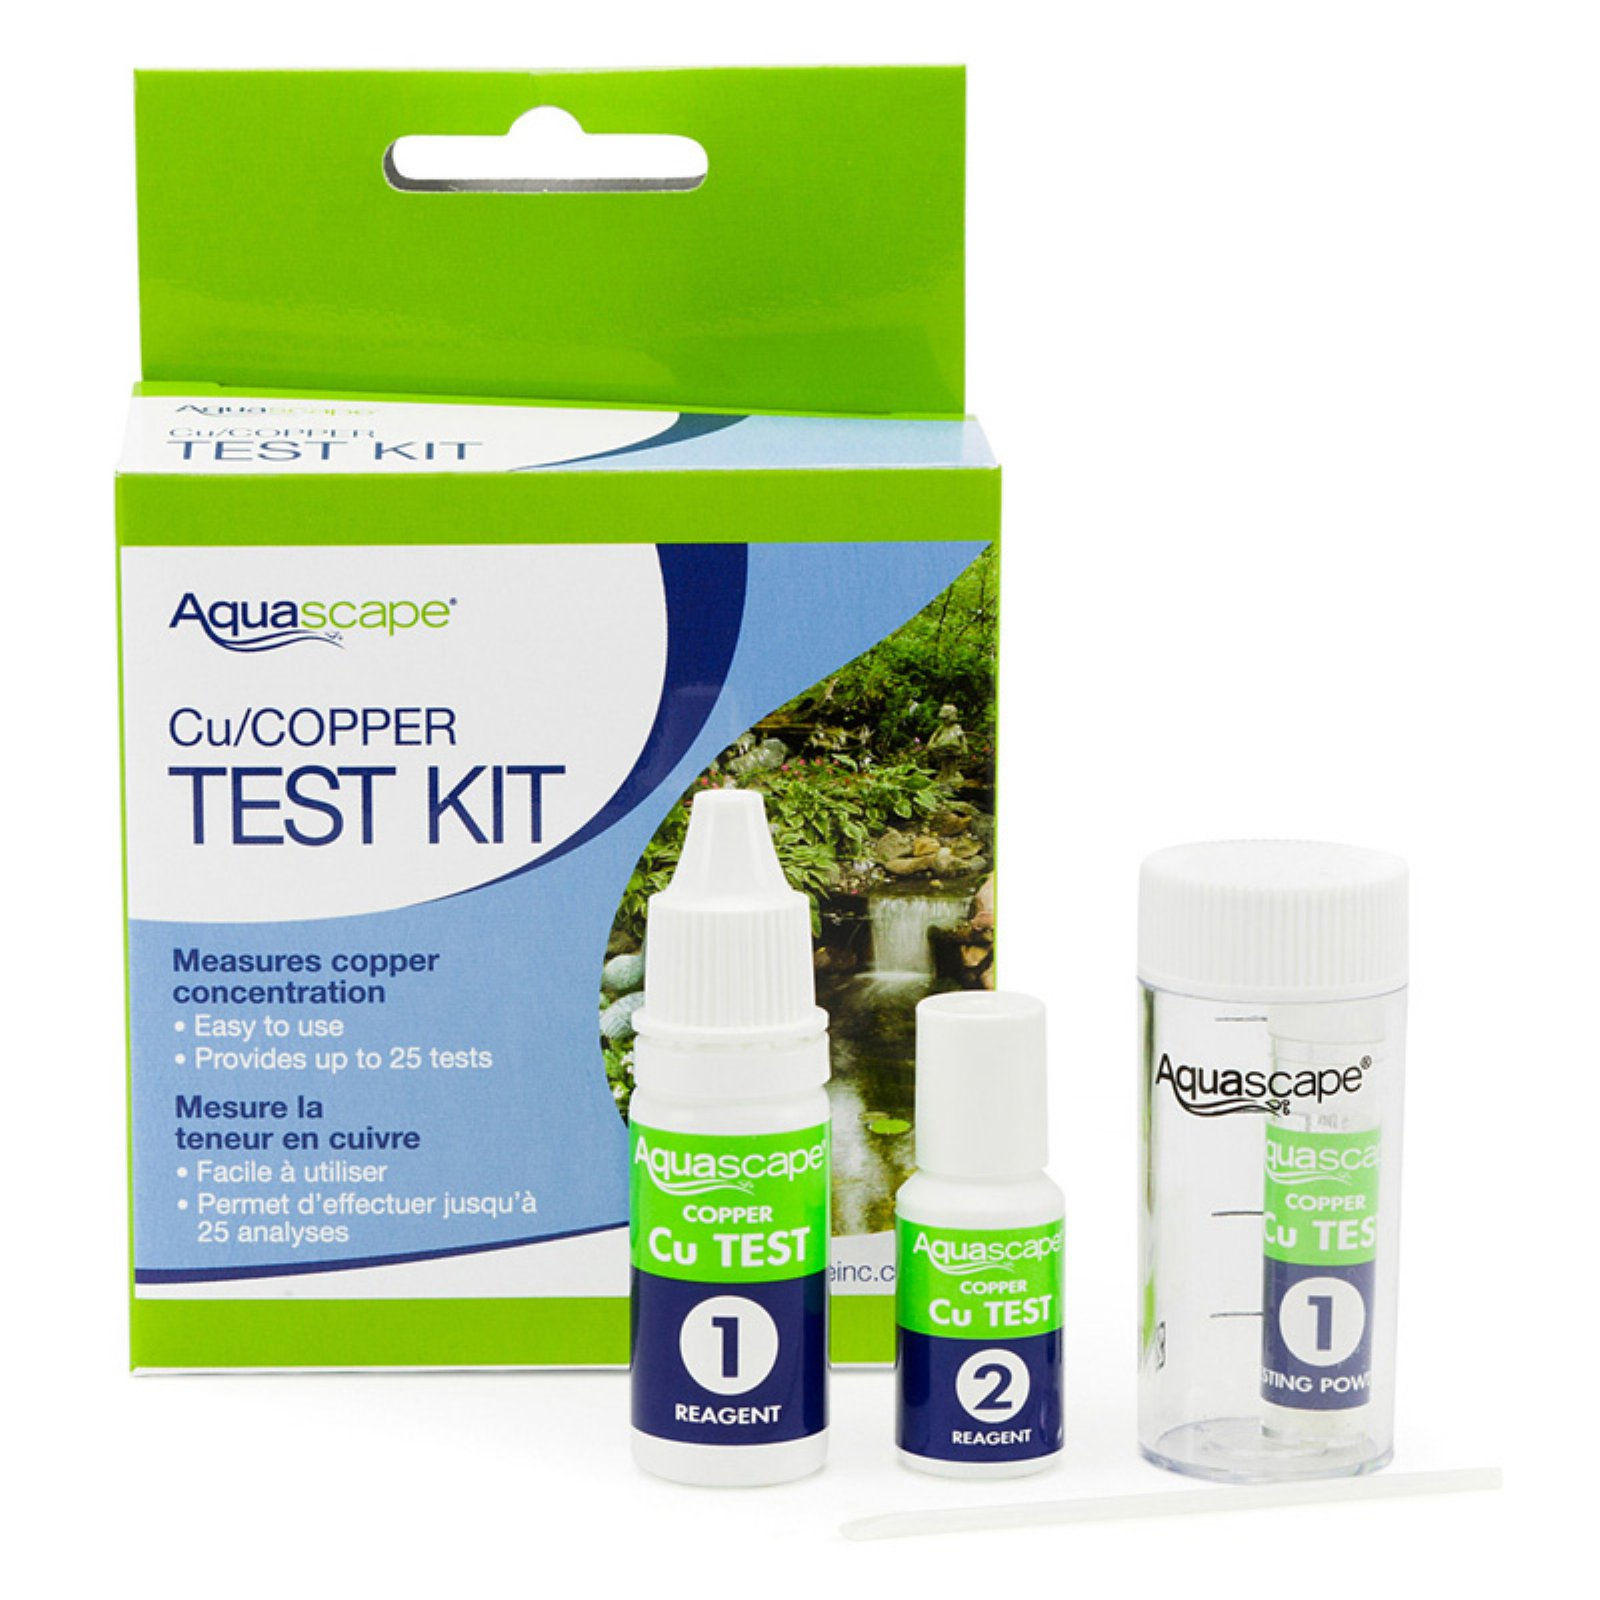 Aquascape Copper Water Test Kit